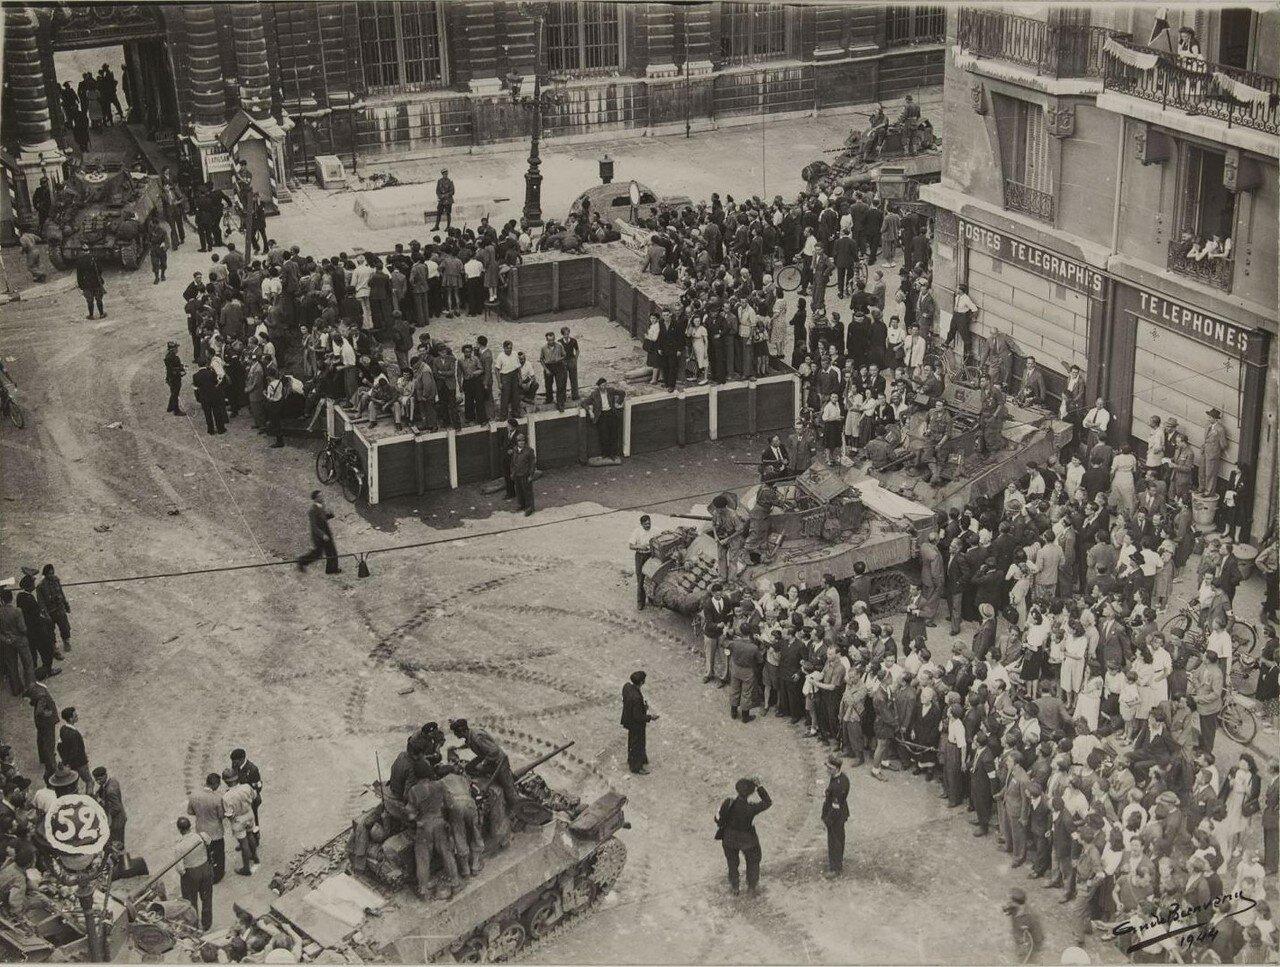 25 августа. Толпа и танки перед Сенатом